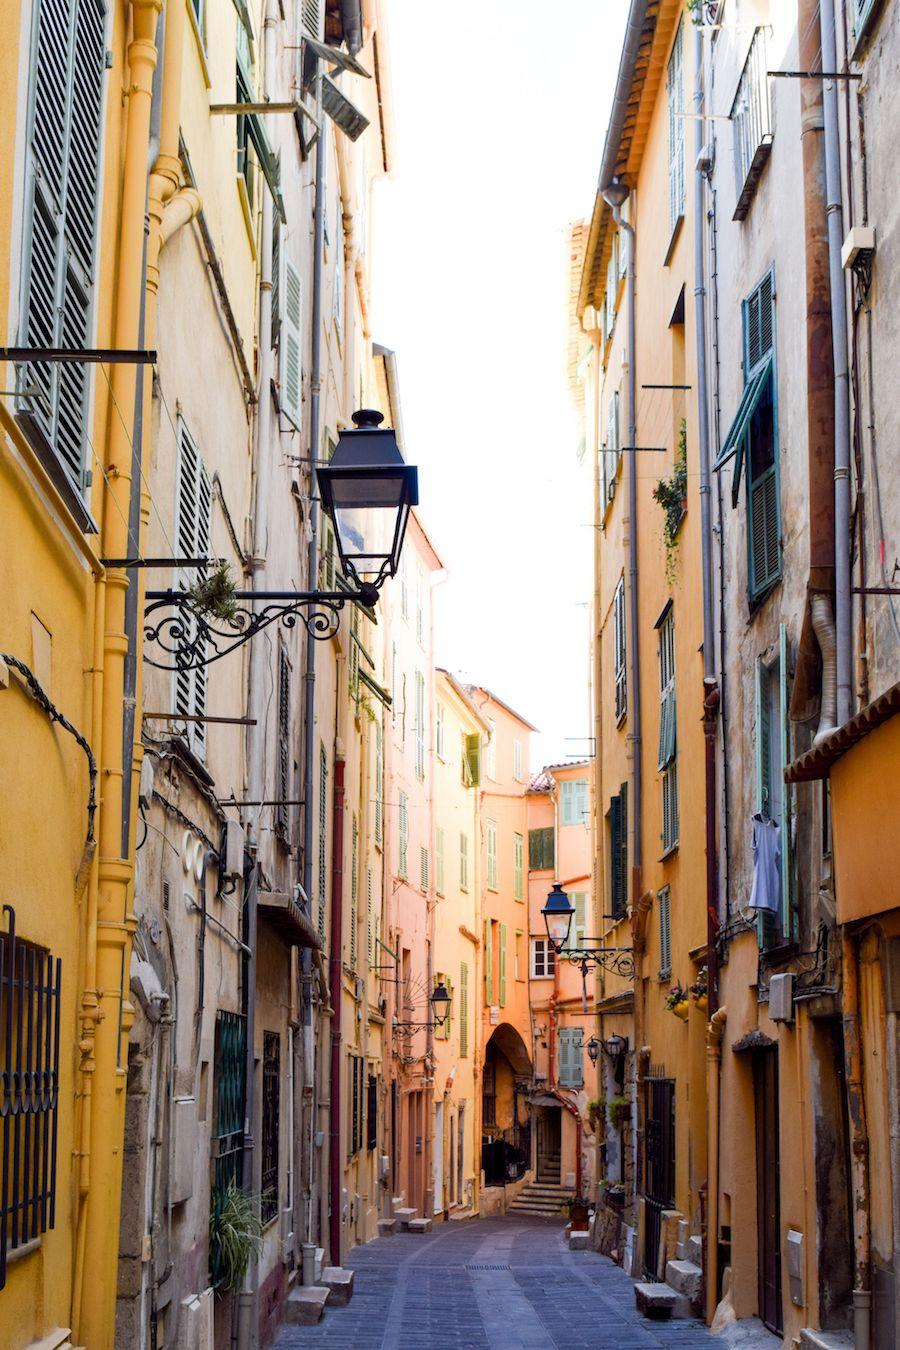 Rue Longue Menton, France